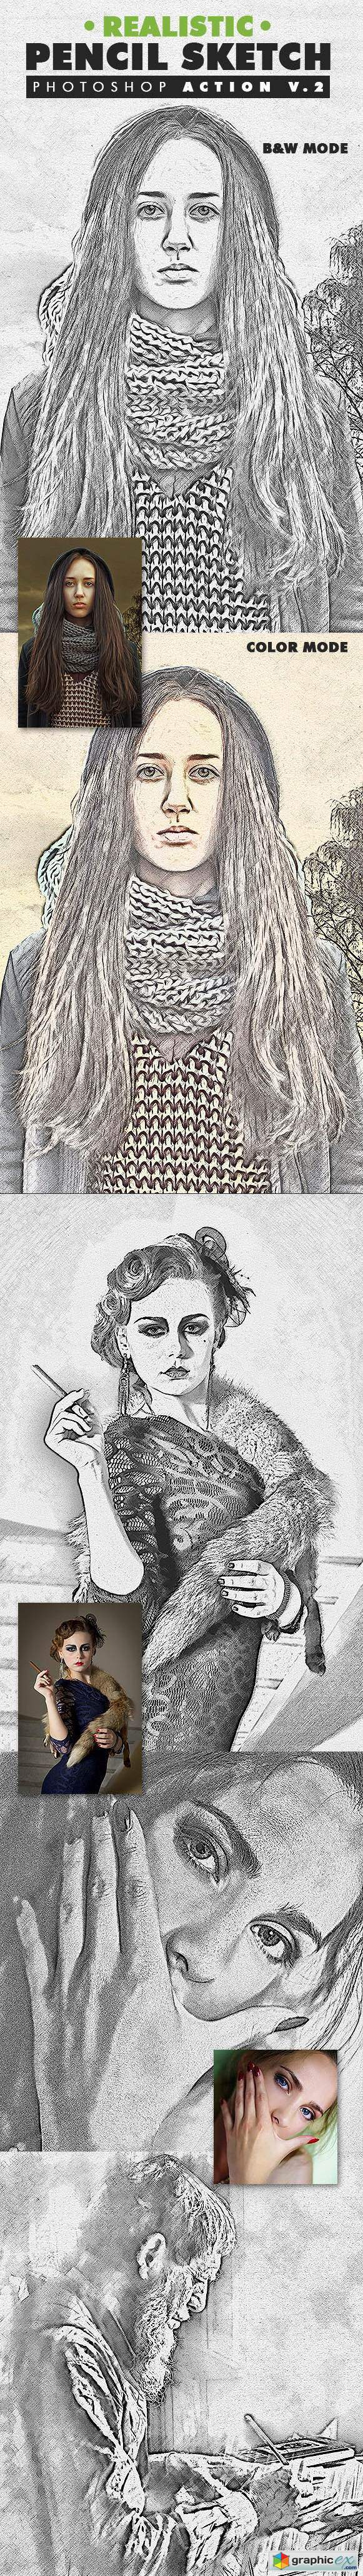 Pencil sketch pattern photoshop free download